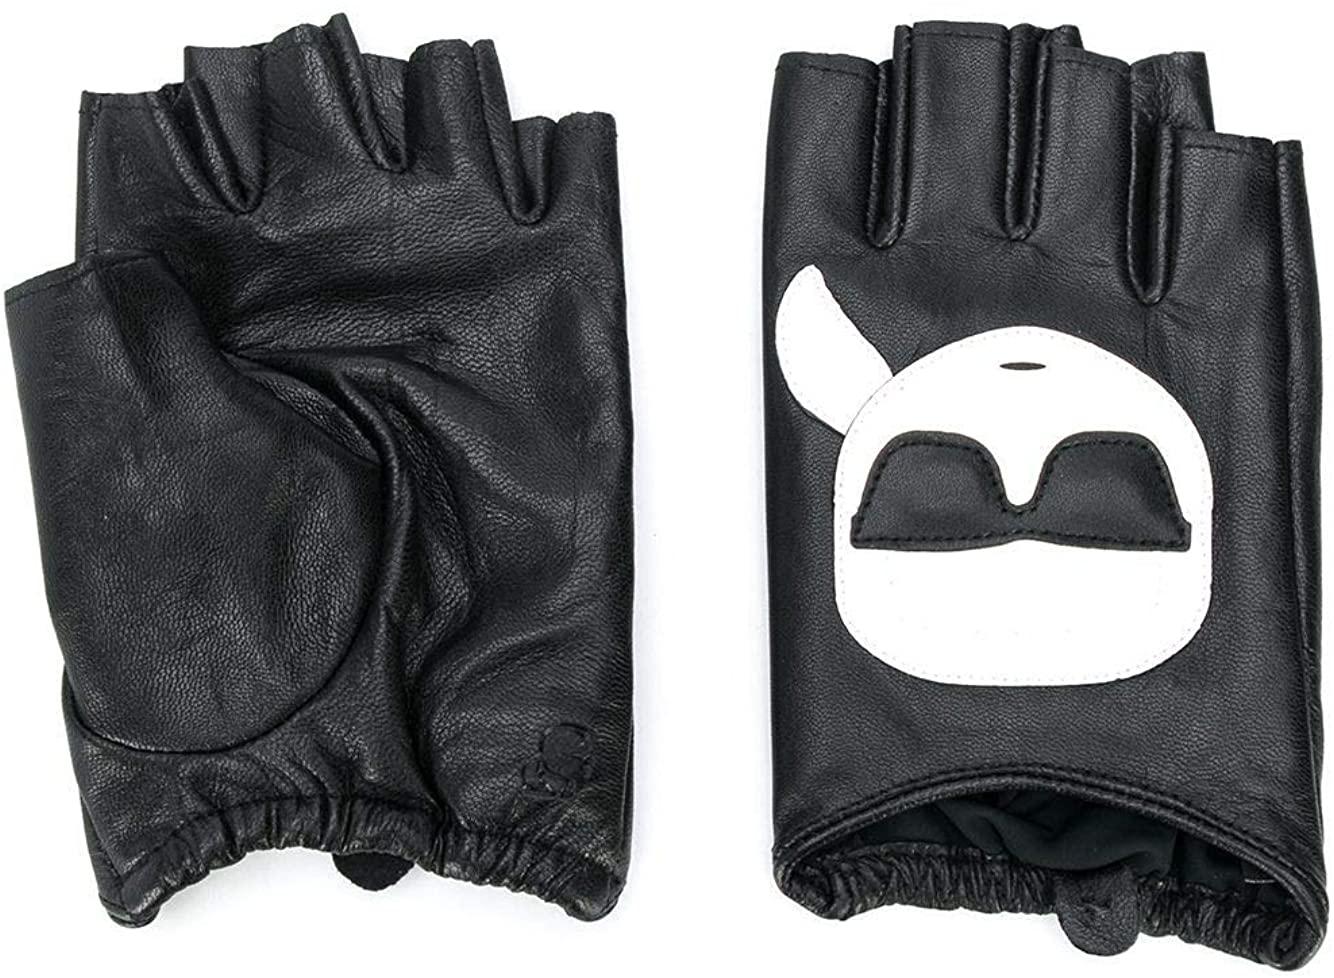 Luxury Fashion | Karl Lagerfeld Woman 20KW201W3612BLACK Black Leather Gloves | Spring Summer 20